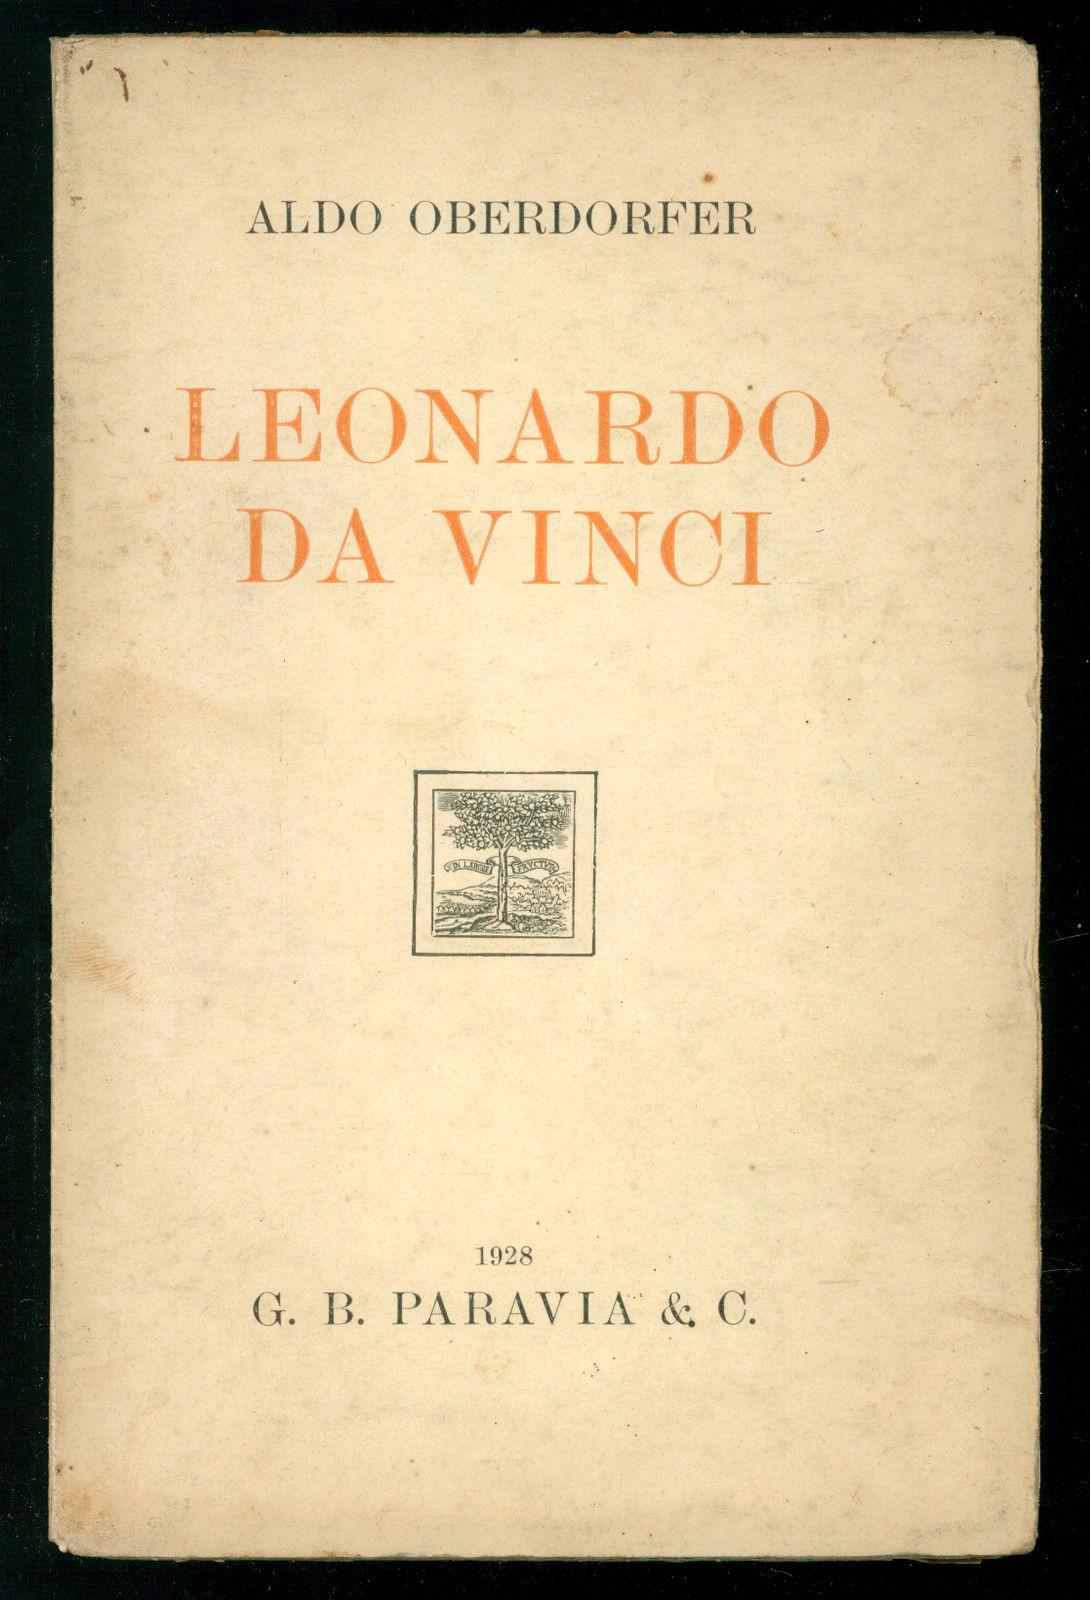 LEONARDO DA VINCI, OBERDORFER ALDO